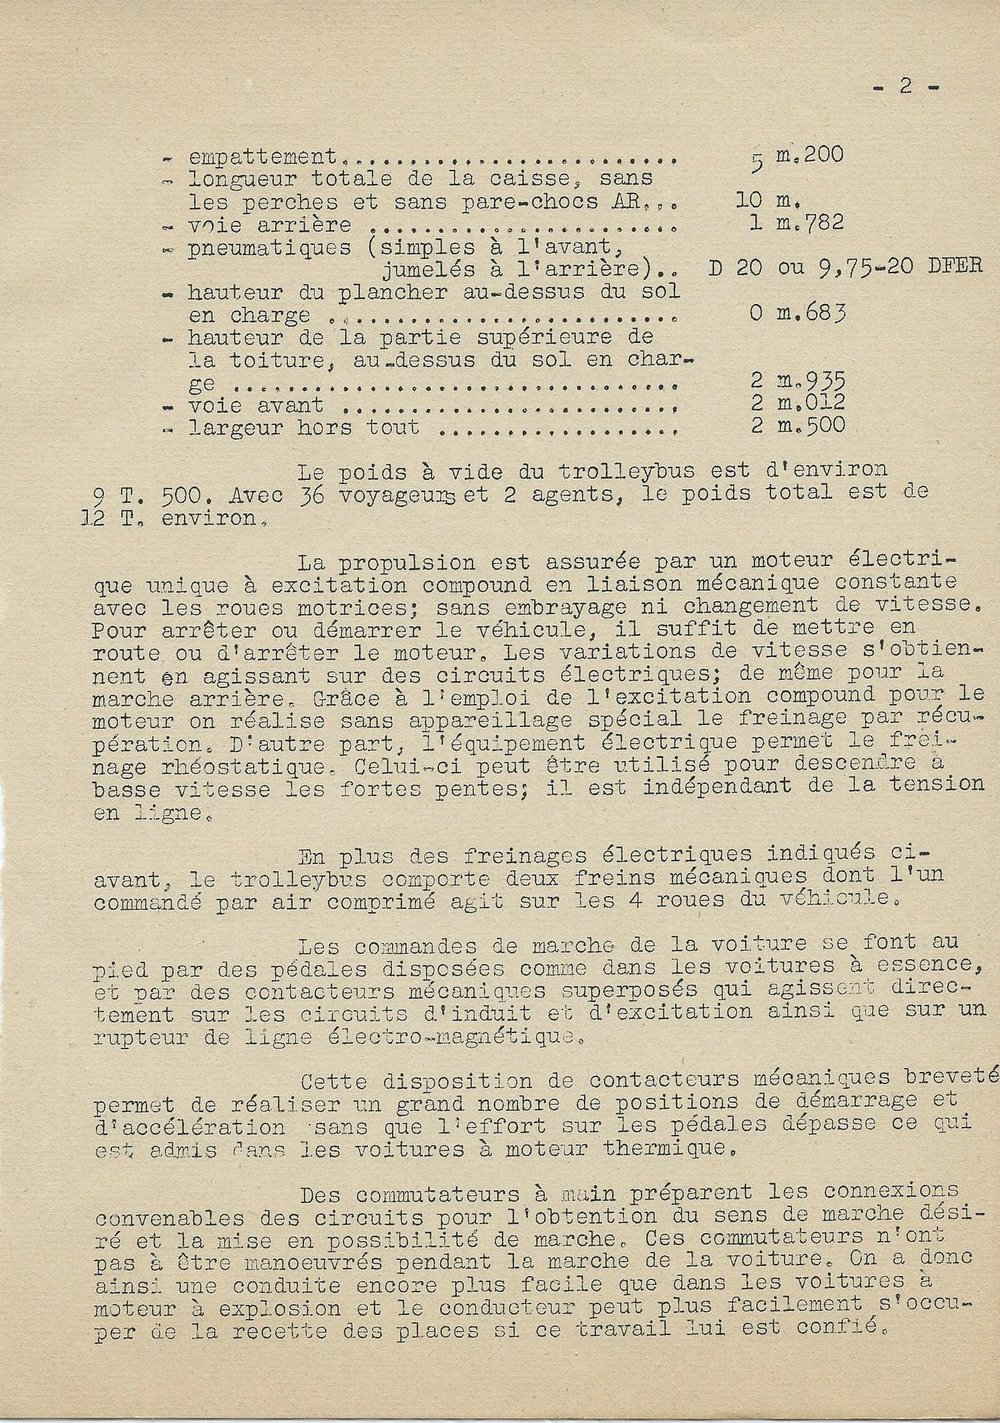 VRBh, série Aix-Marseille, str. 2